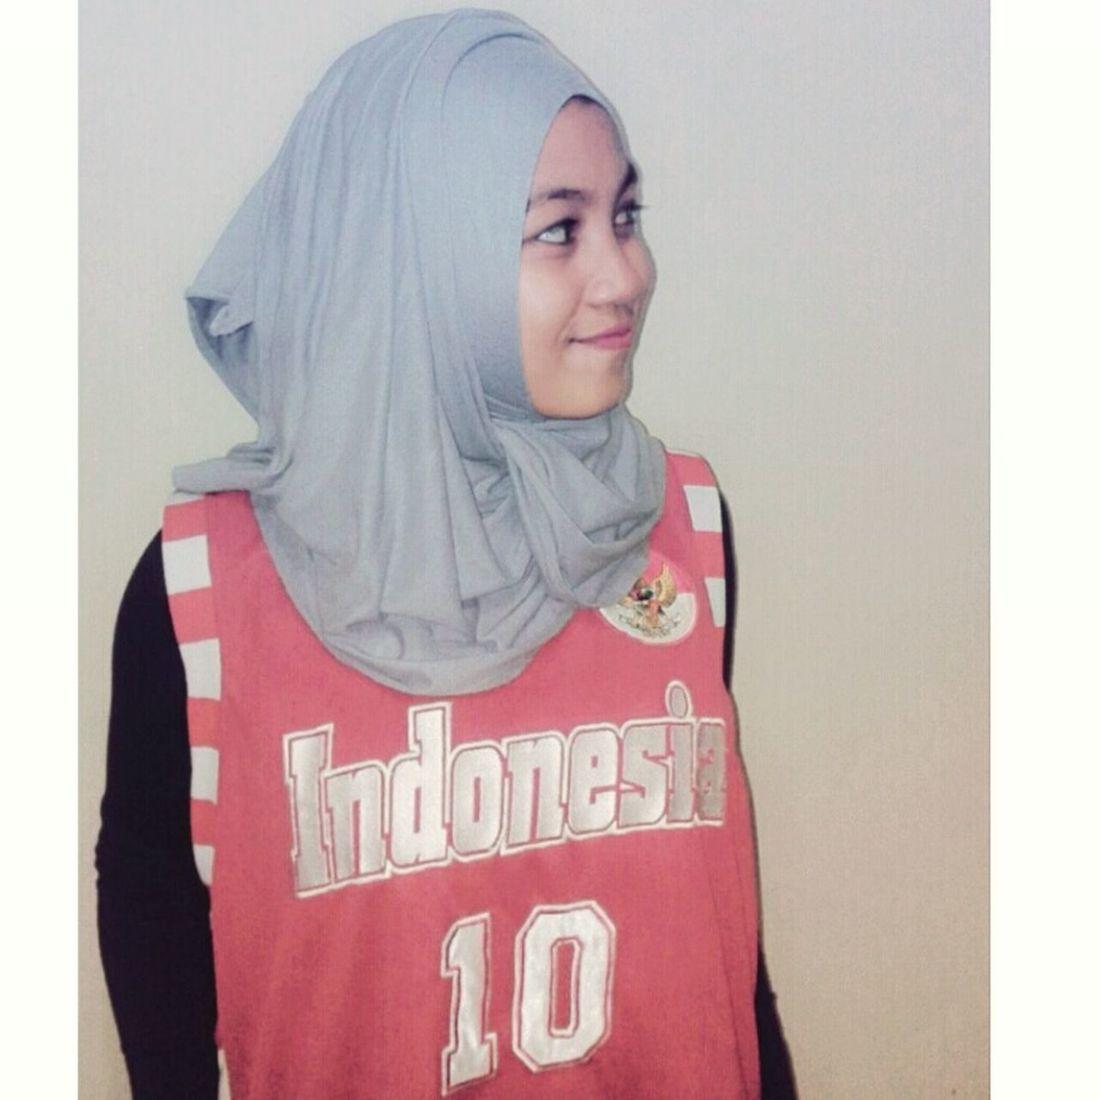 Basketball Swag VSCO INDONESIA Basketballer Cool Instagram follow me on instagram it's silmafoxx